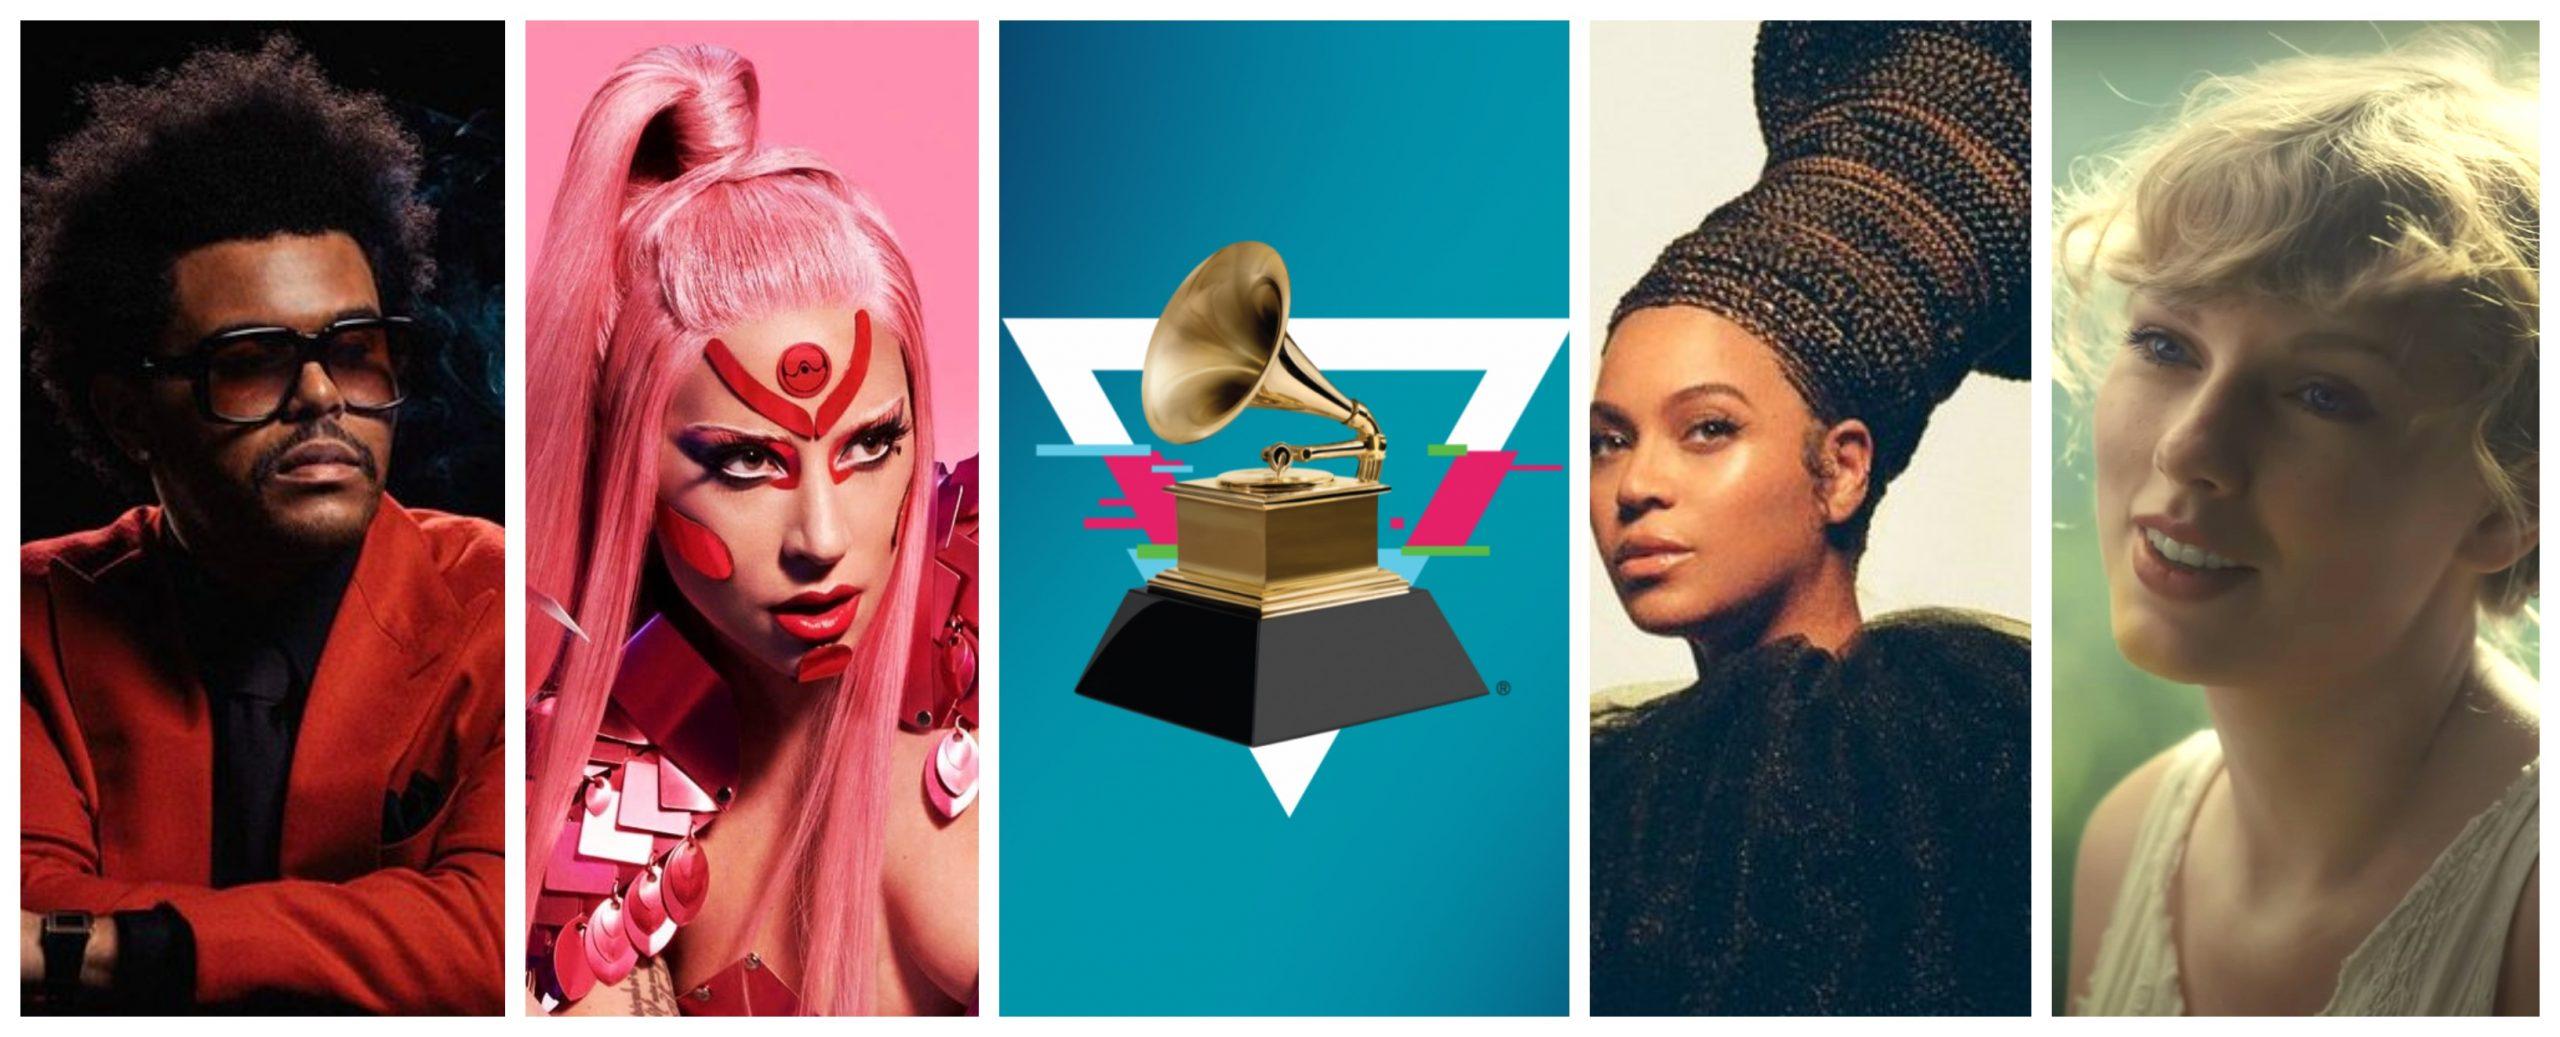 grammy nominations 2021 - photo #5